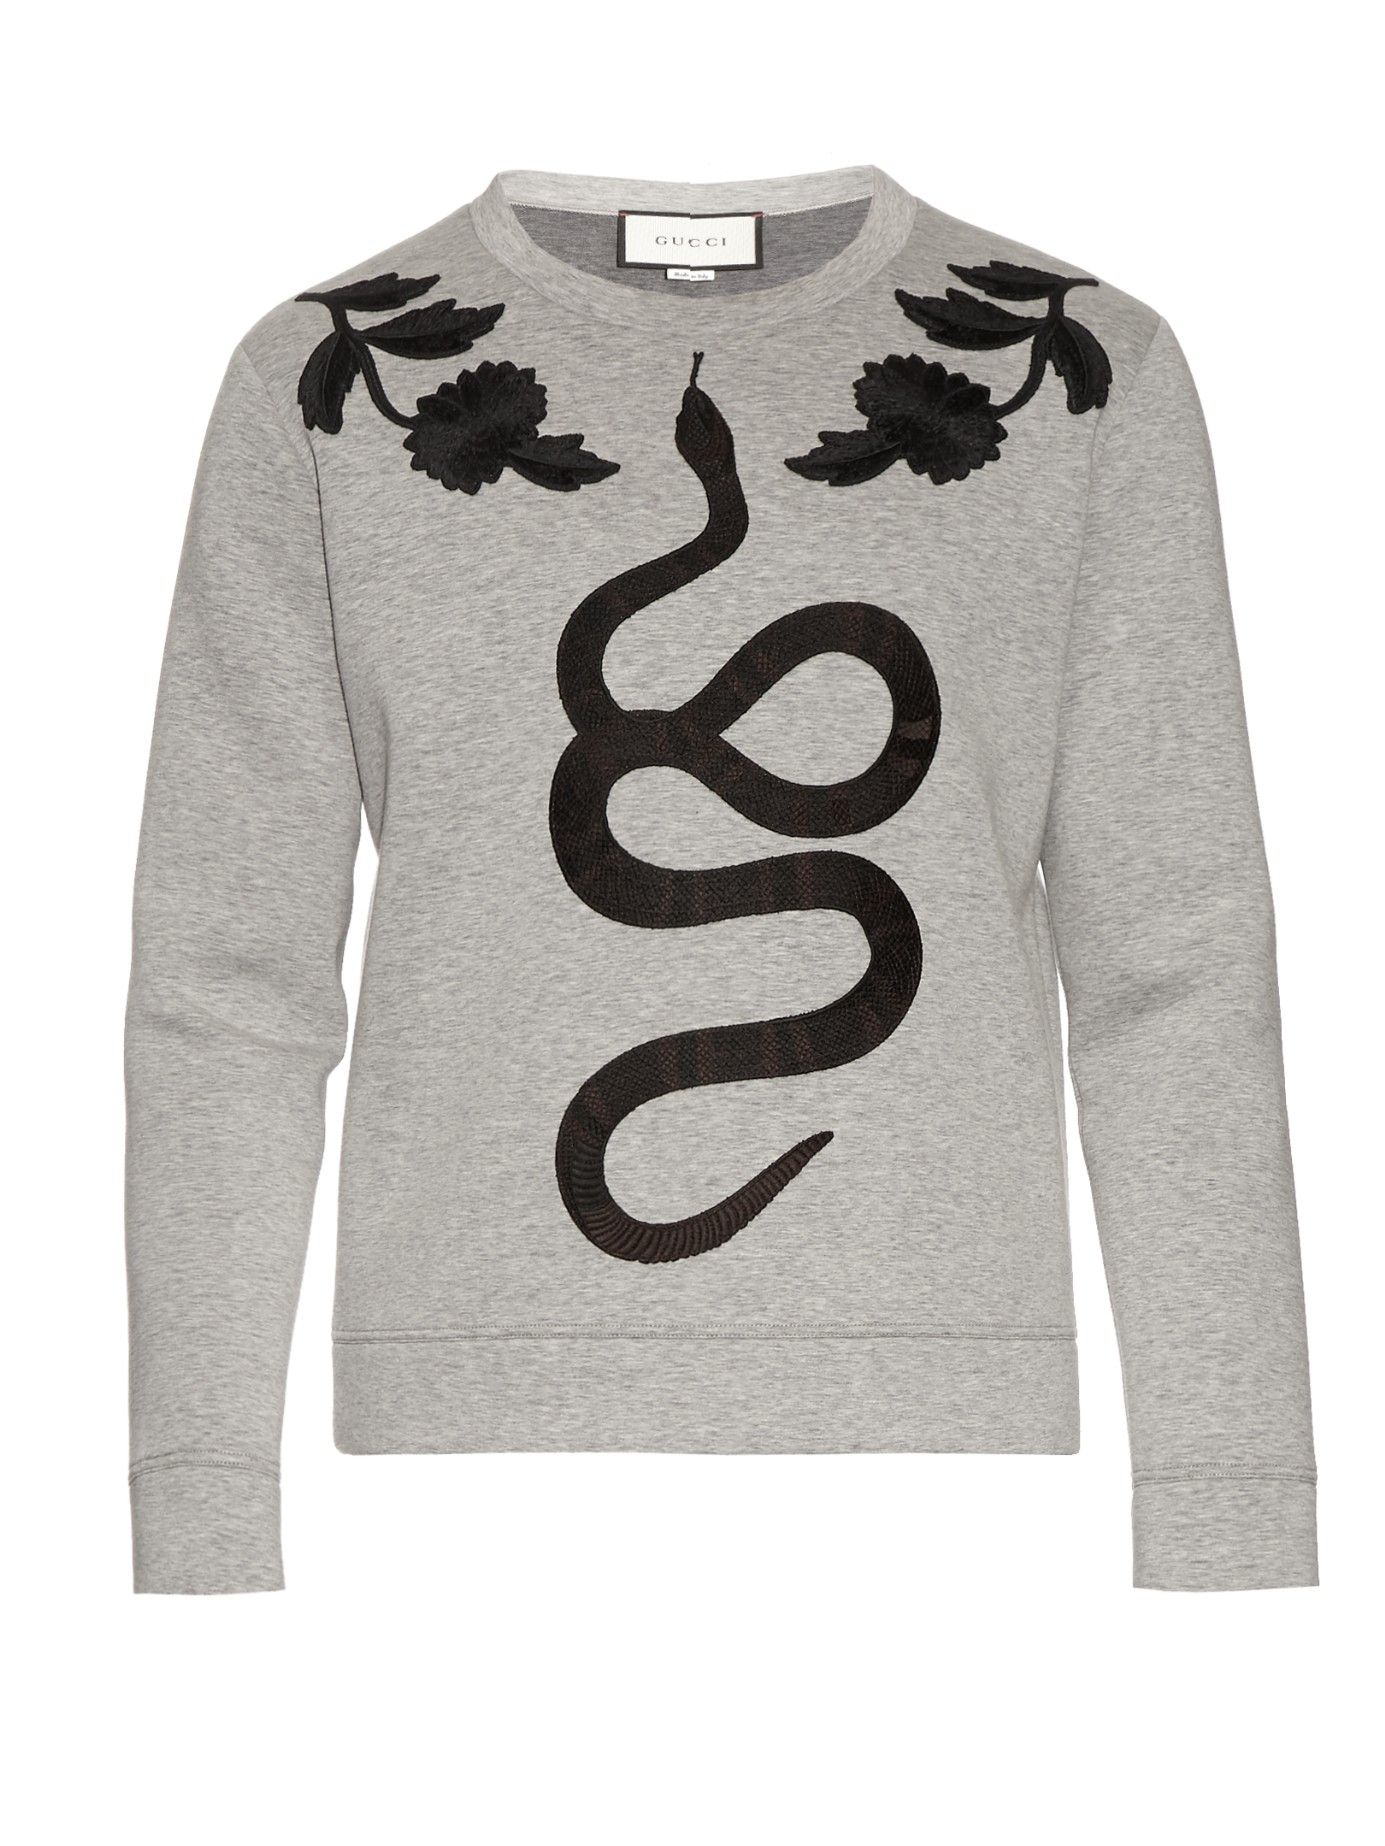 59a38696583 GUCCI Snake-appliqué cotton-jersey sweatshirt